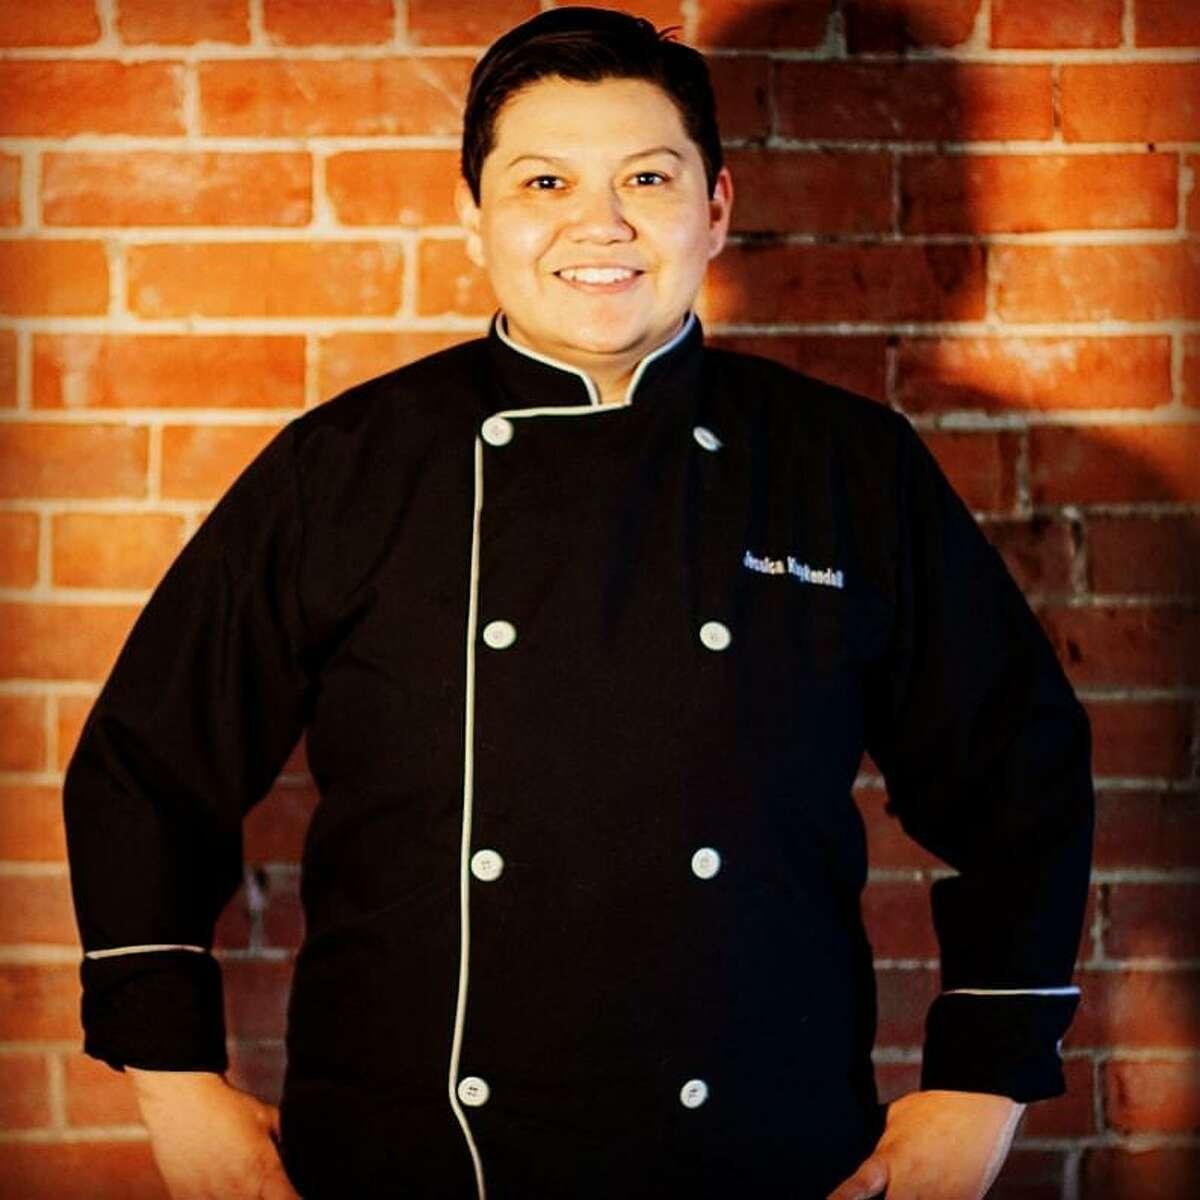 Chef Jesse Kuykendall, or